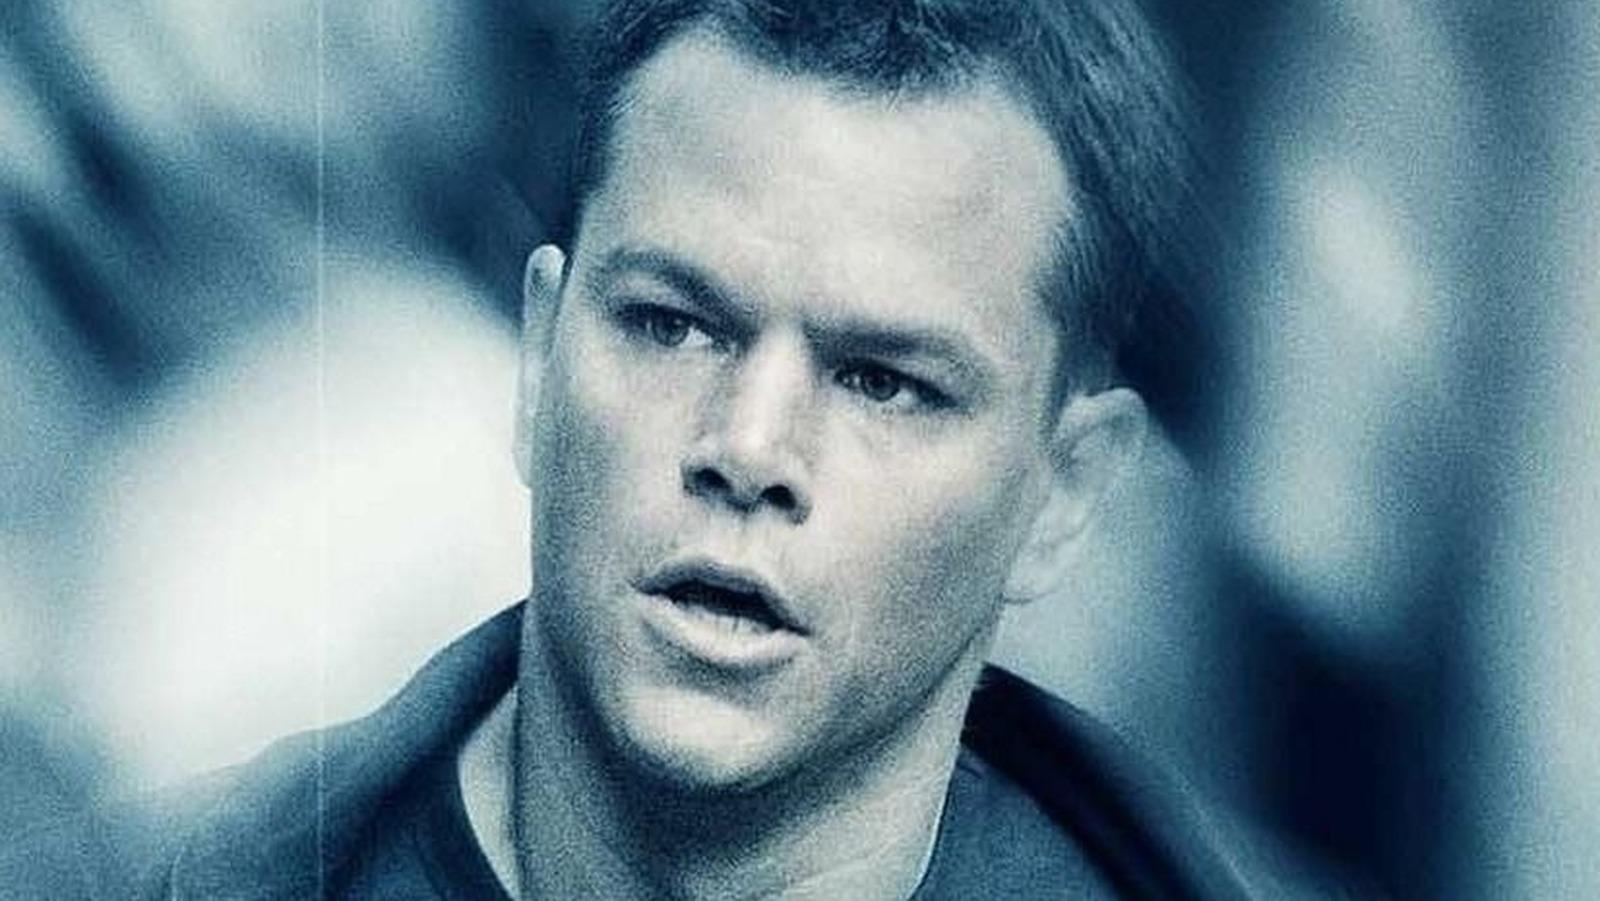 Will We Ever Get A Jason Bourne 6?